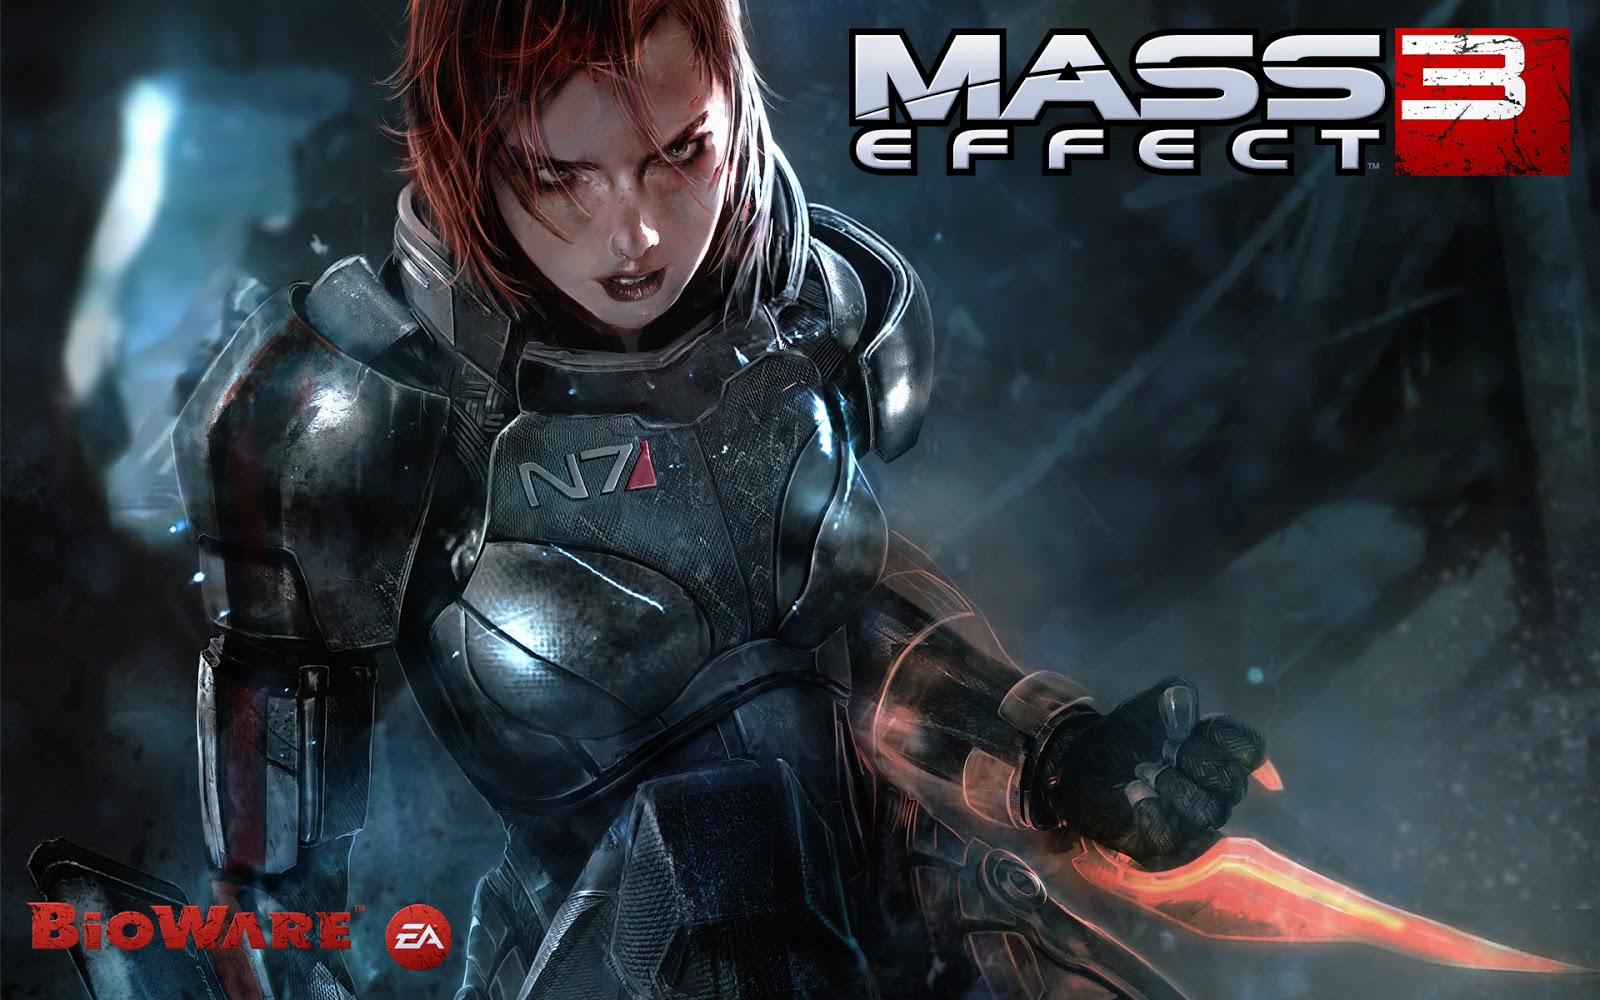 Female Shepard in Mass Effect 3 Wallpapers